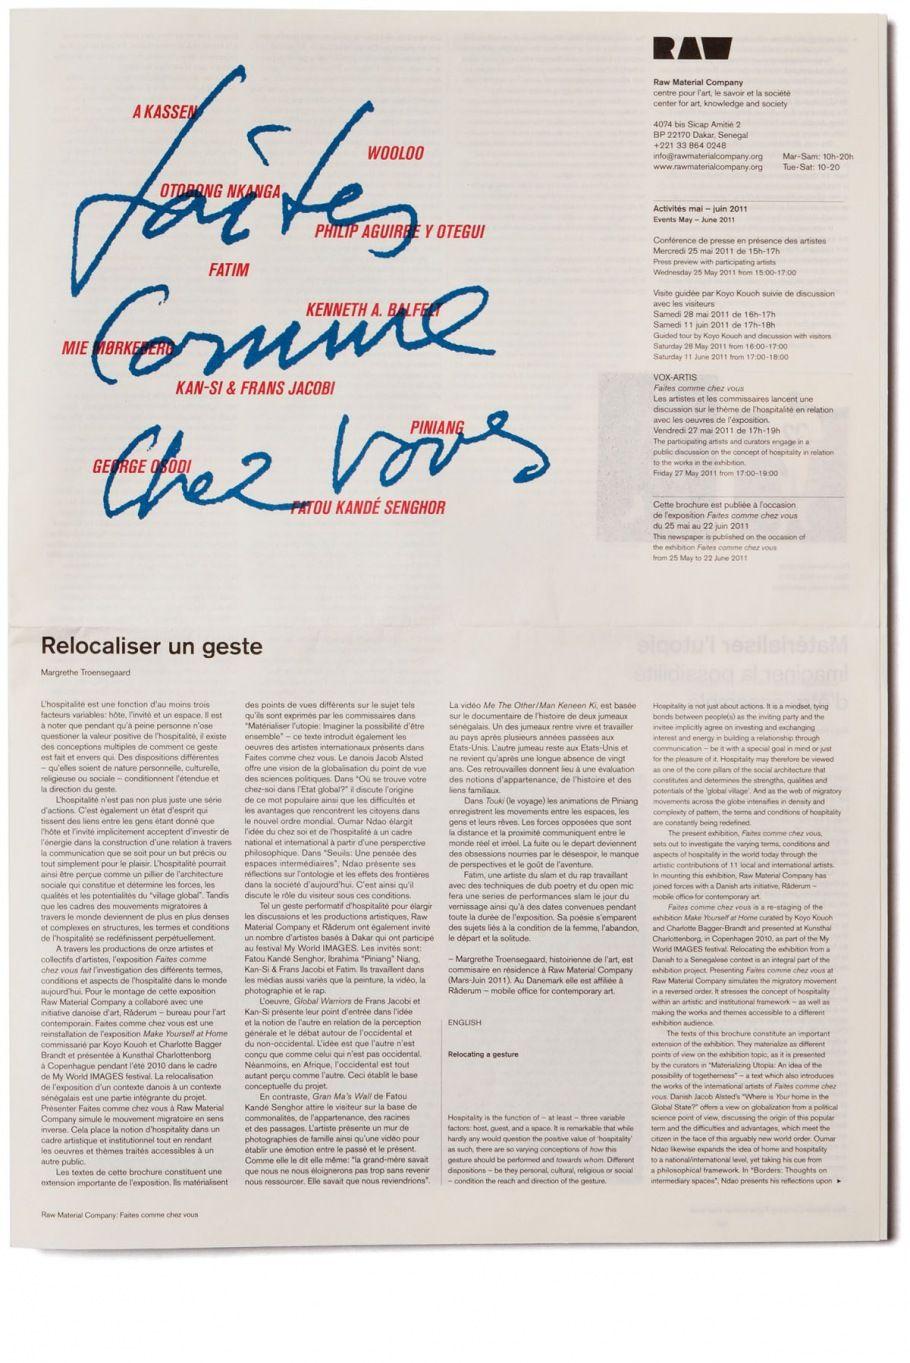 Rasmus Koch Studio Faites Comme Chez Vous タイポグラフィー 字体 グラフィックデザイン